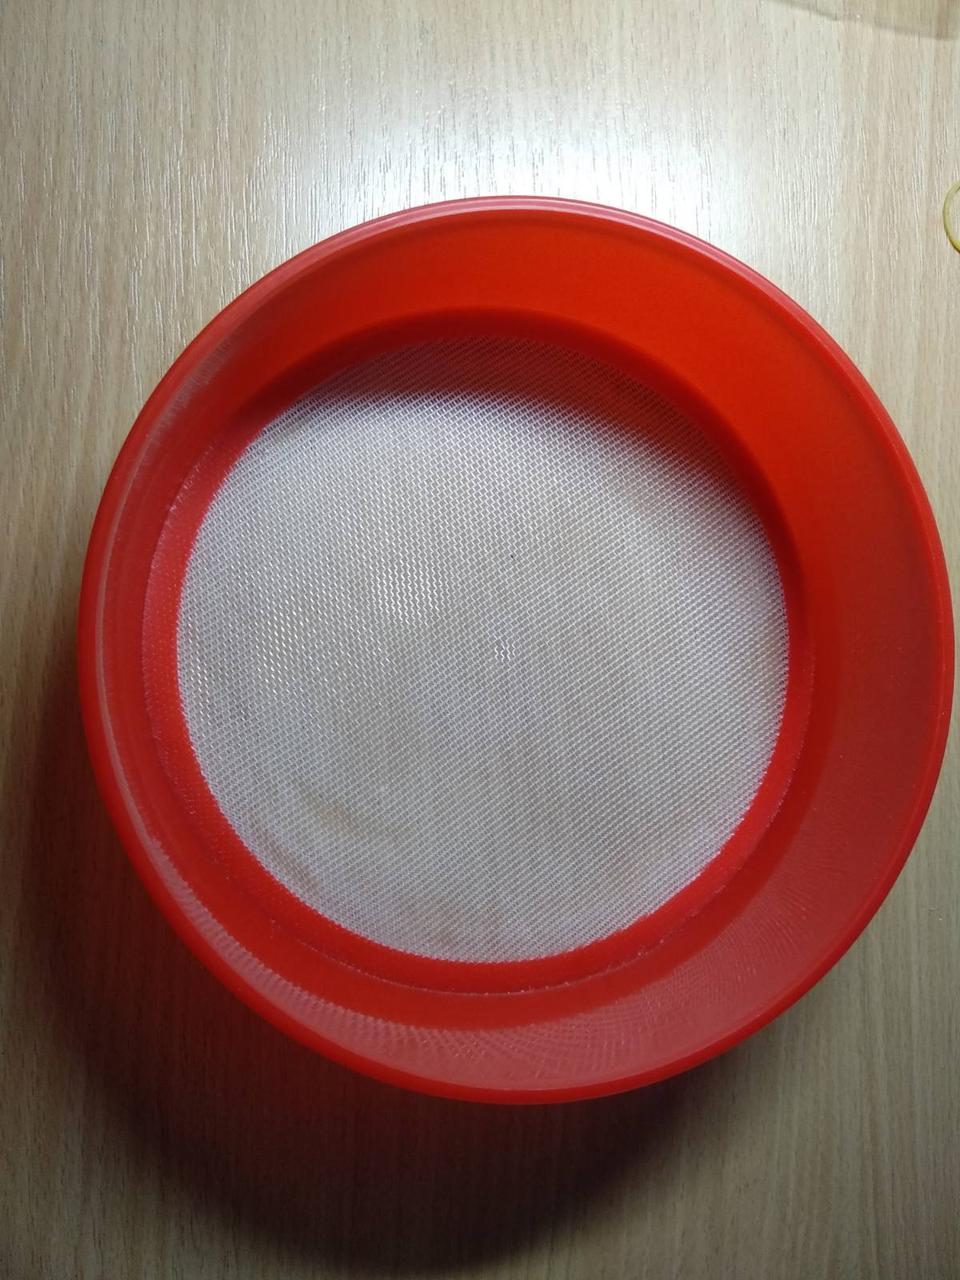 Сито пластиковое для муки d-18 cм